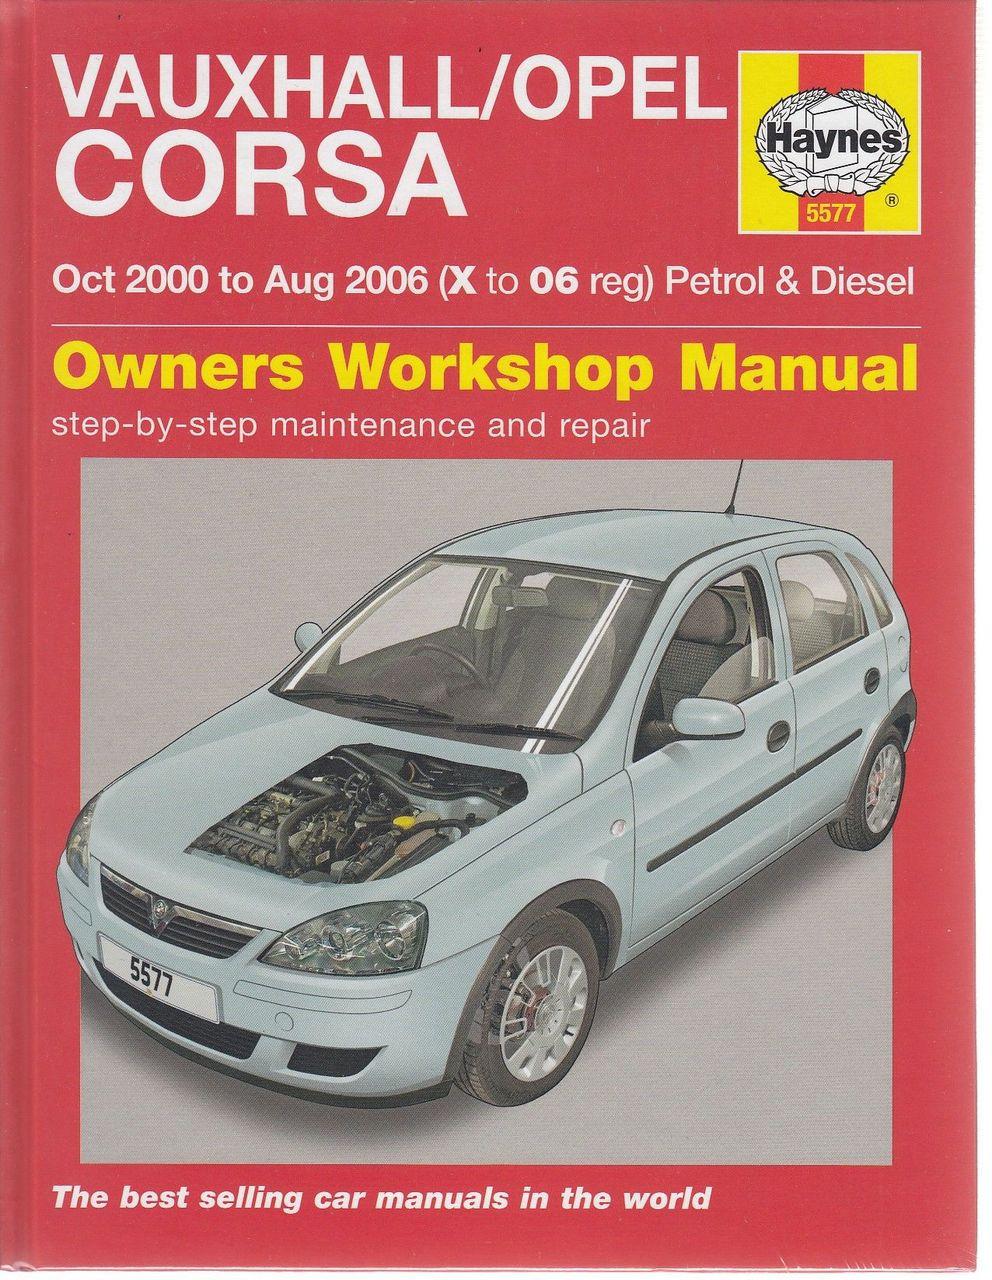 holden barina 2000 2006 petrol diesel workshop manual rh automotobookshop com au opel corsa c repair manual pdf opel corsa c service manual pdf